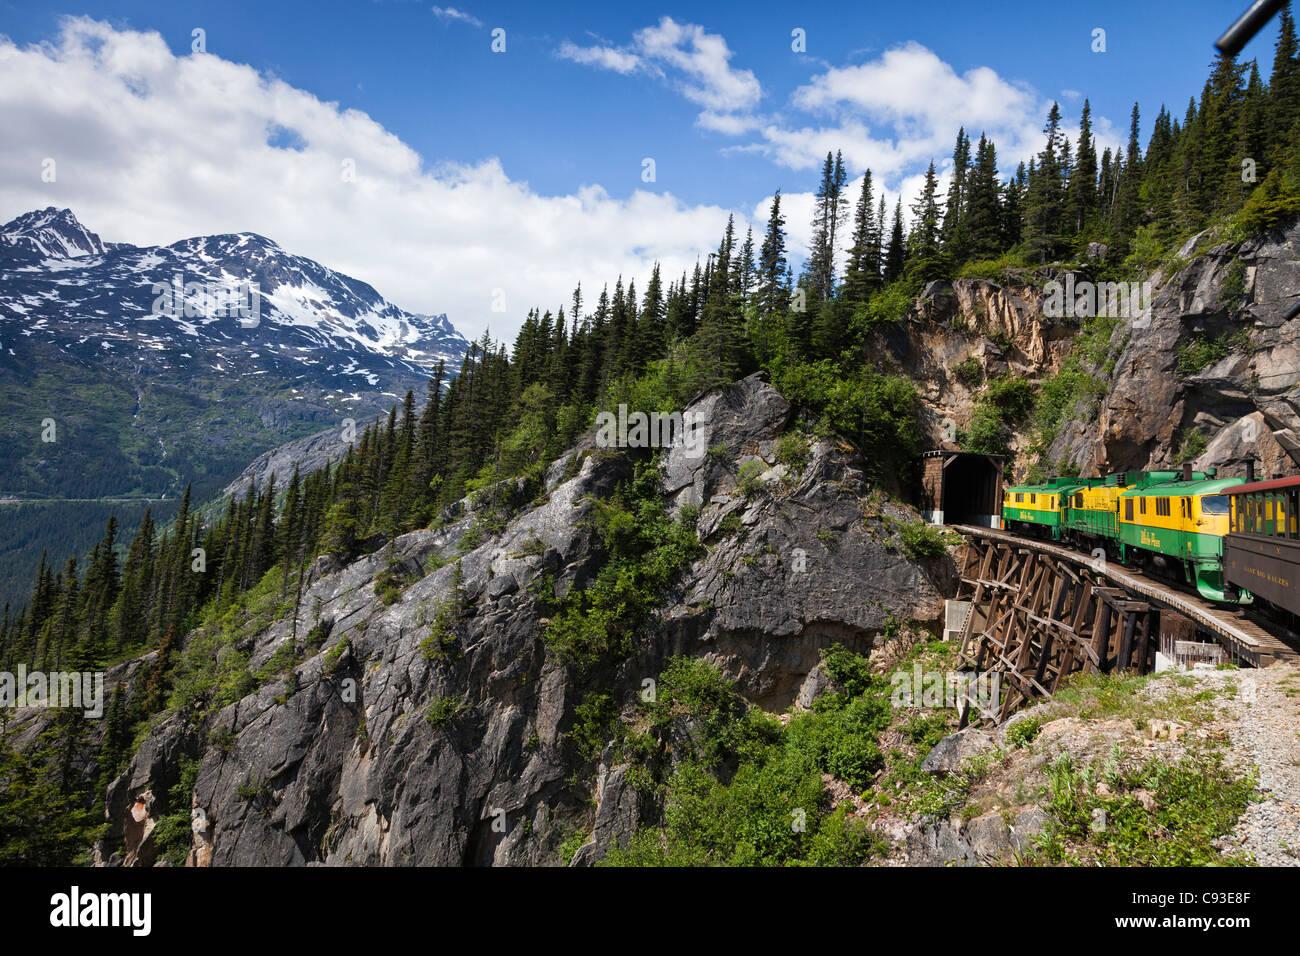 White Pass and Yukon Railroad en route from Skagway Alaska